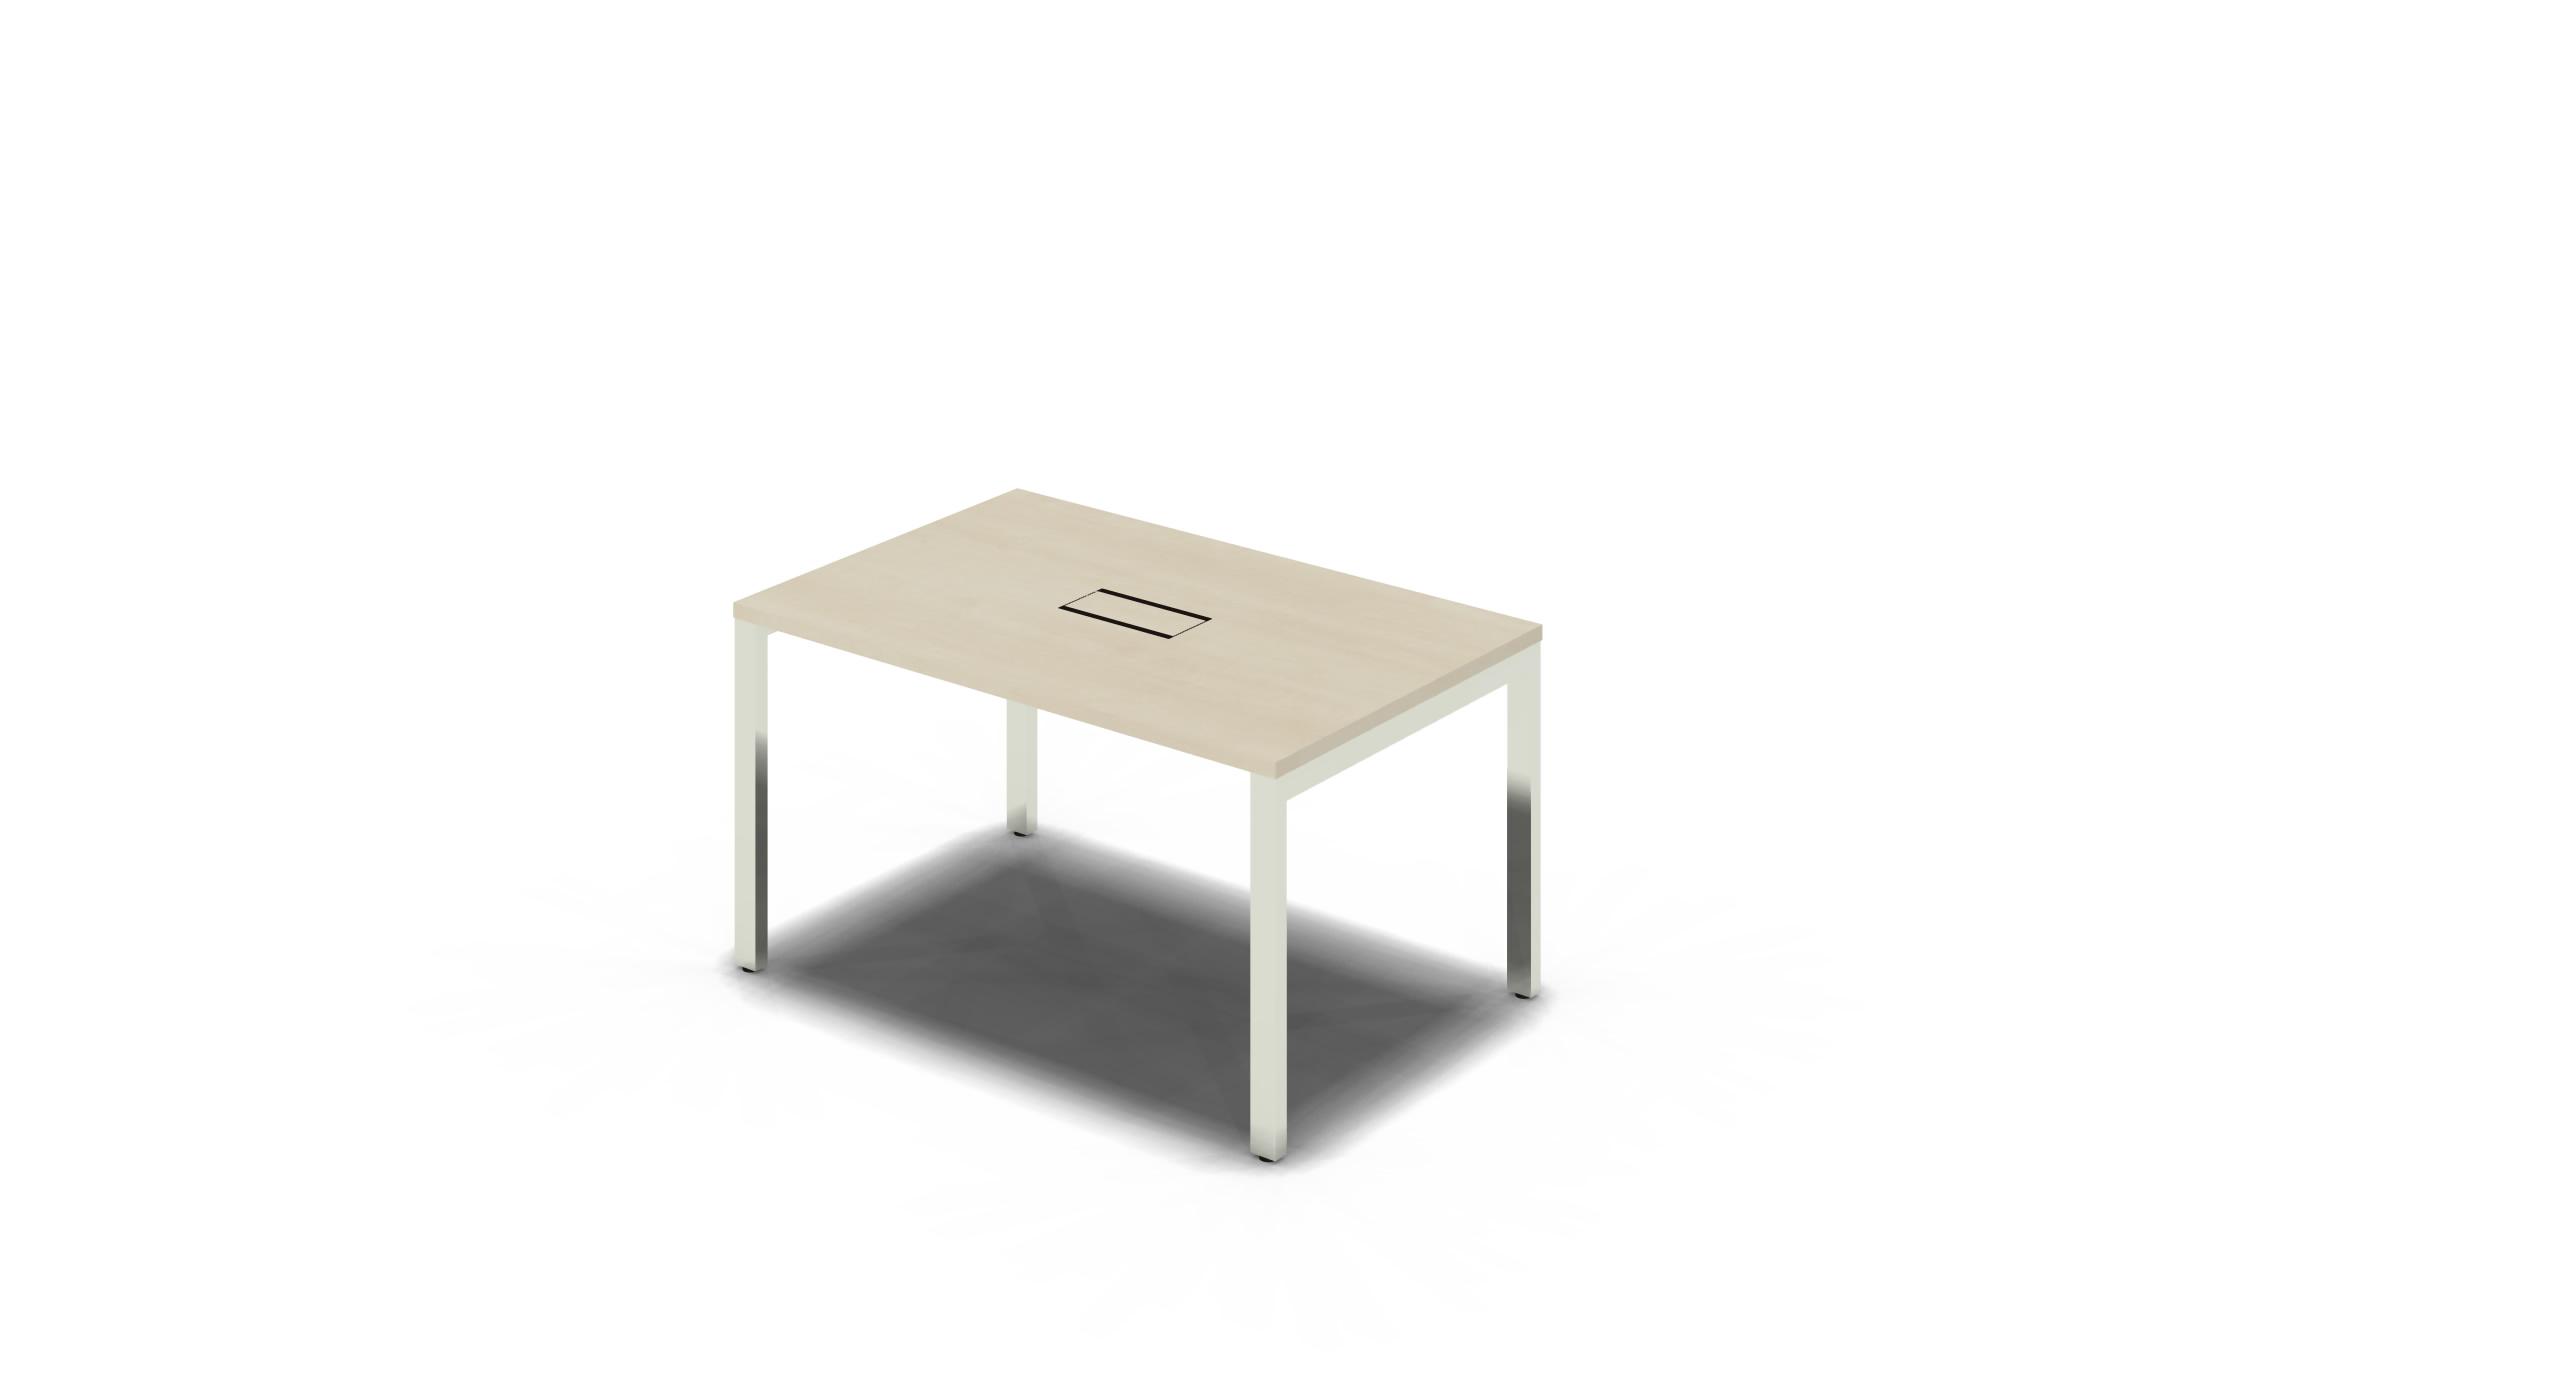 Table_Square_1200x750_Chrome_Maple_withOption